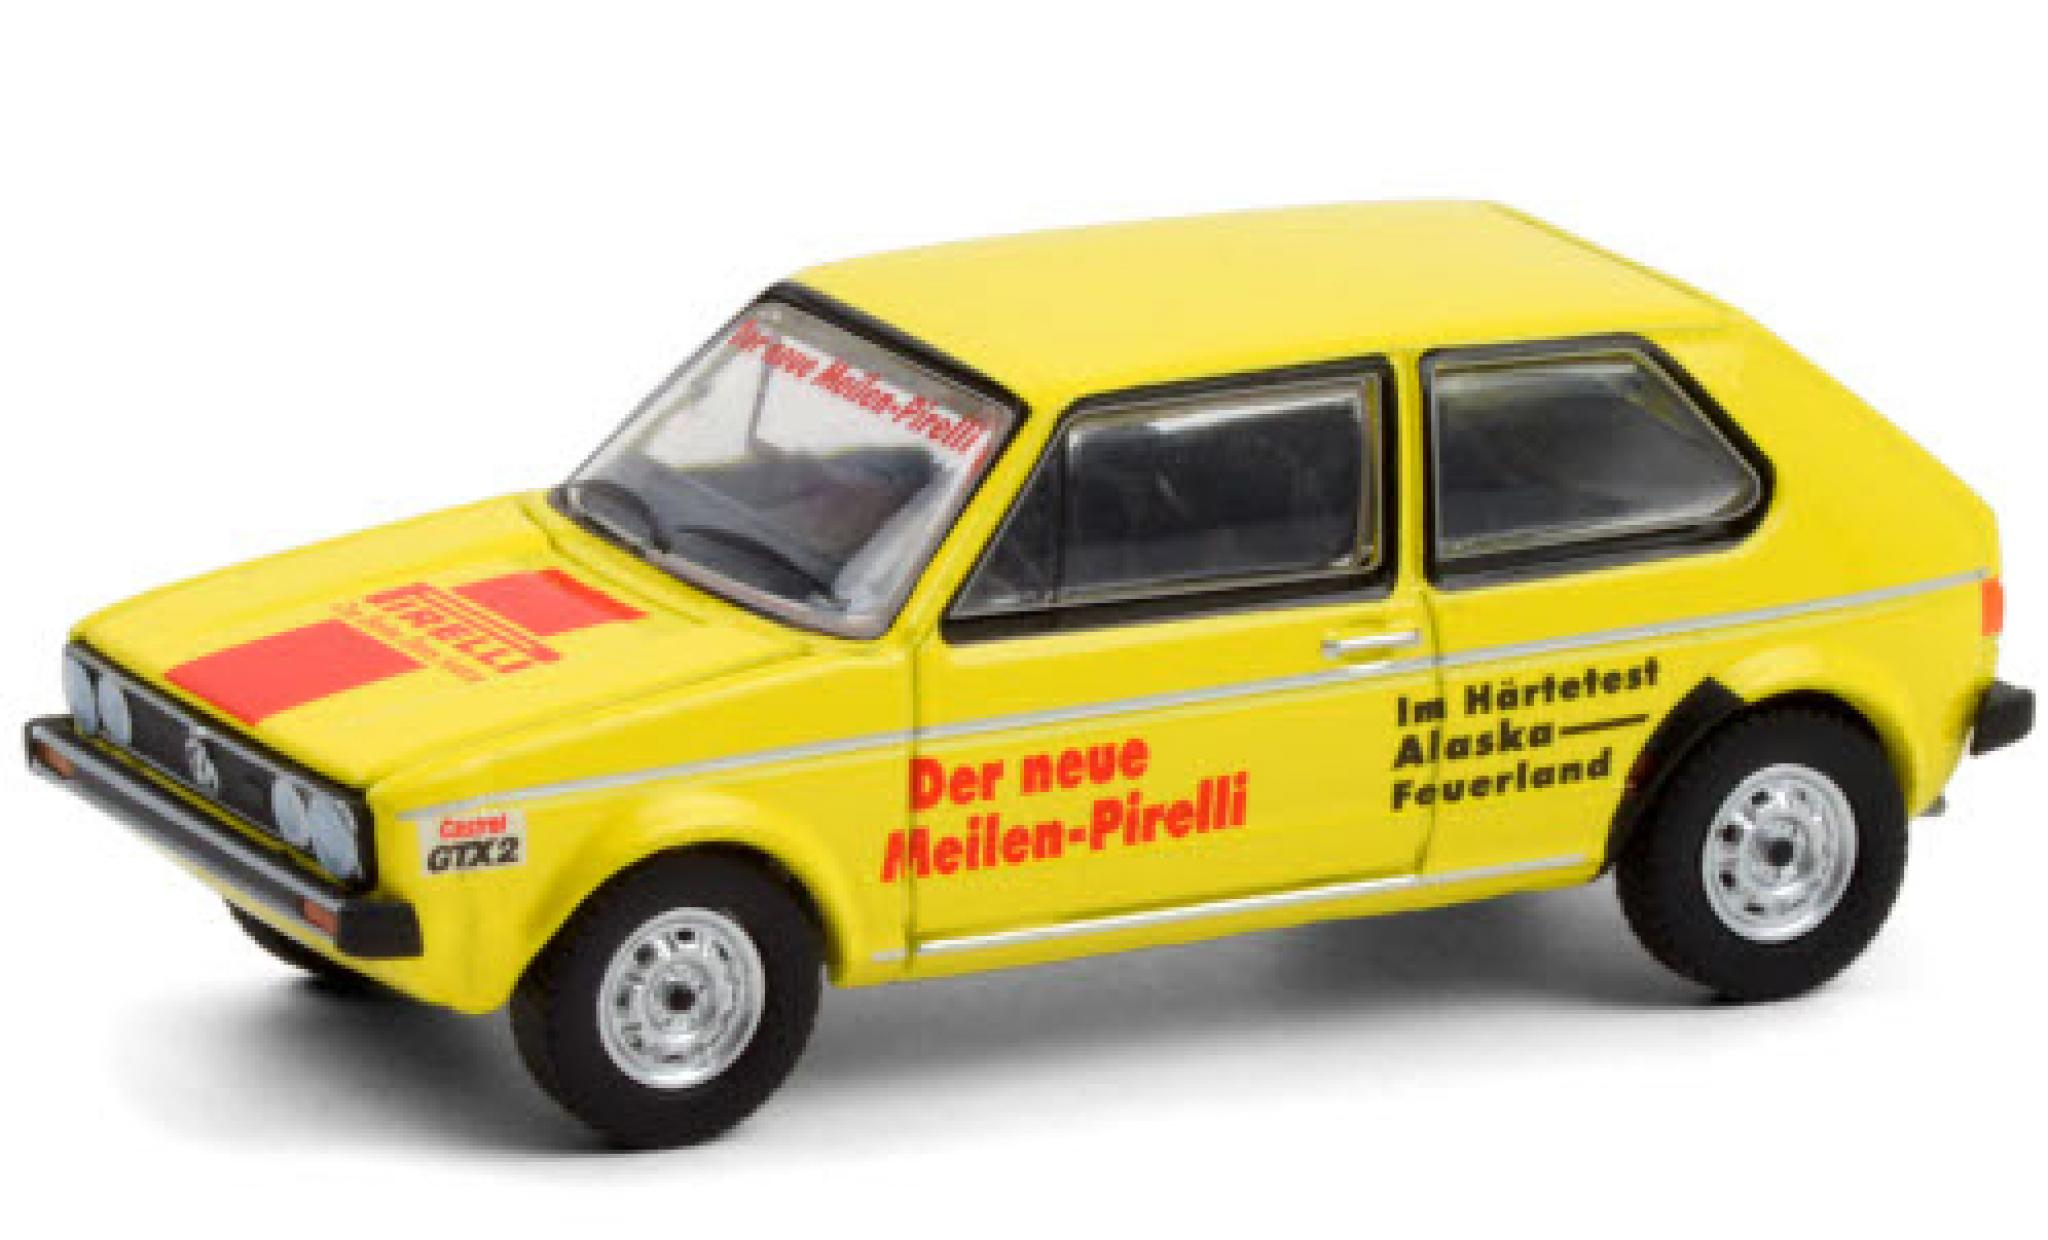 Volkswagen Golf 1/64 Greenlight I jaune/Dekor Pirelli 1974 Härtetest: Alaska - Feuerland